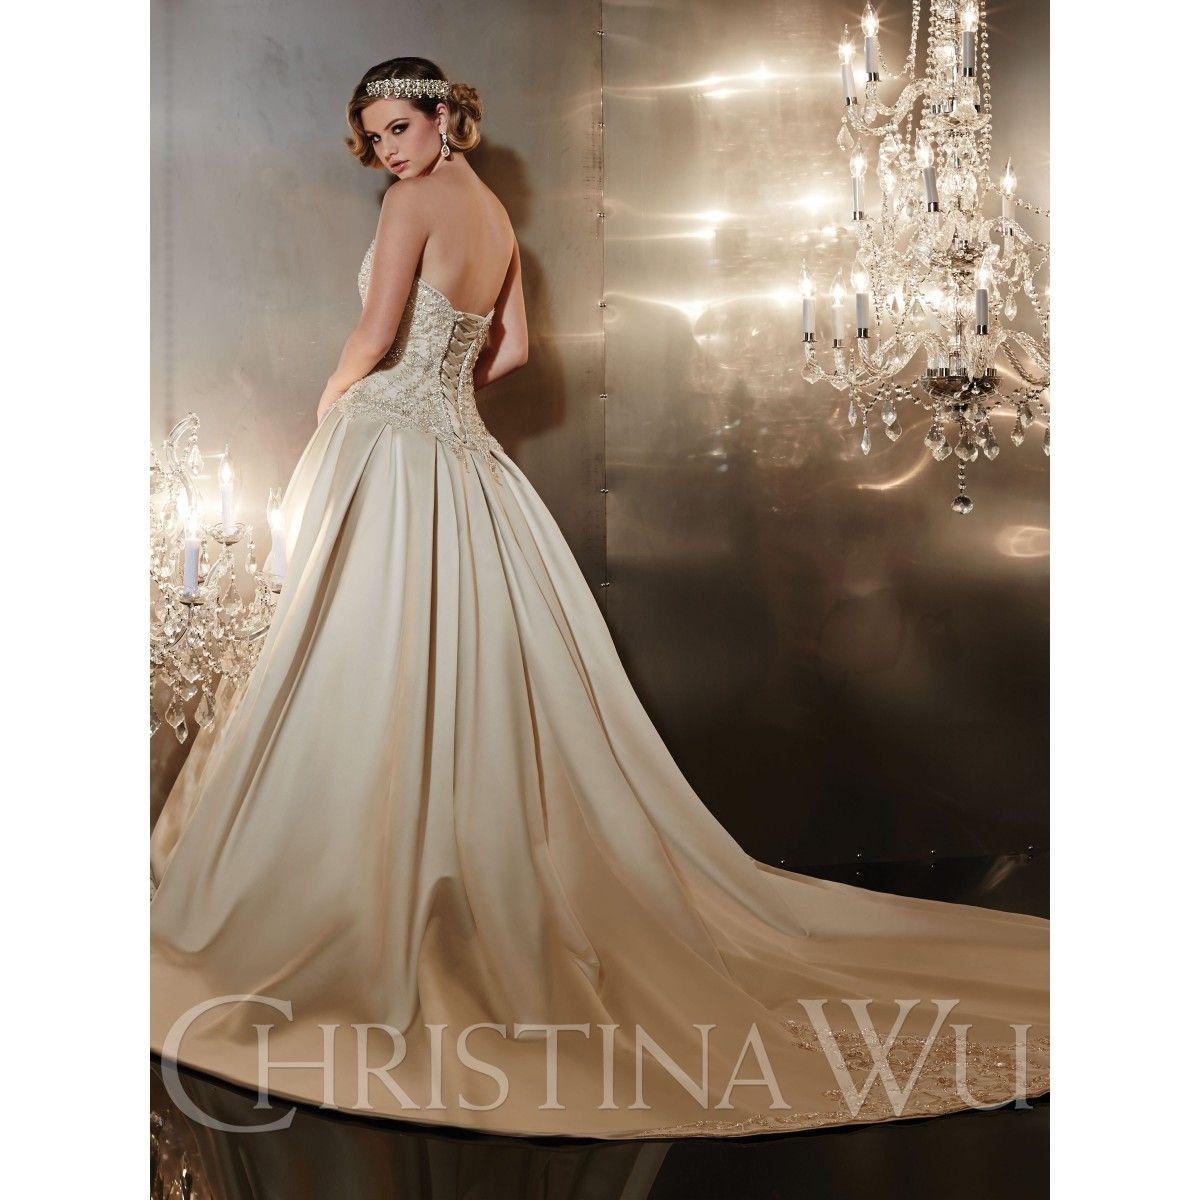 Christina wu wedding dresses  Style  weddingdress weddinggown vestidodenovia christinawu